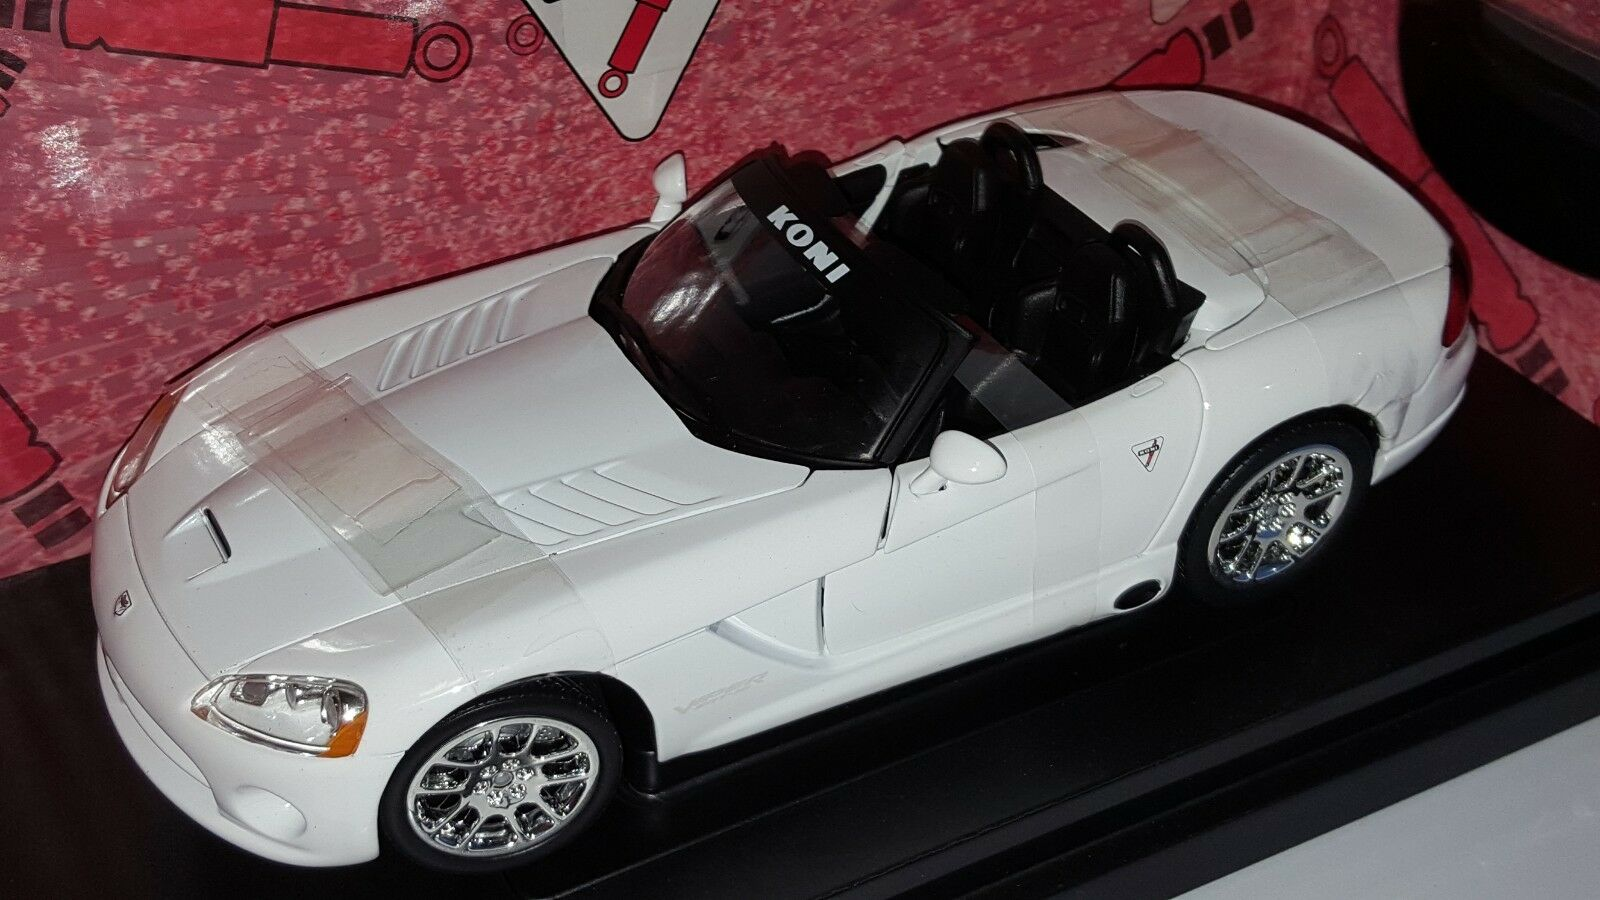 1 18 ERTL AMERICAN MUSCLE KONI 2003 DODGE VIPER blanc gd